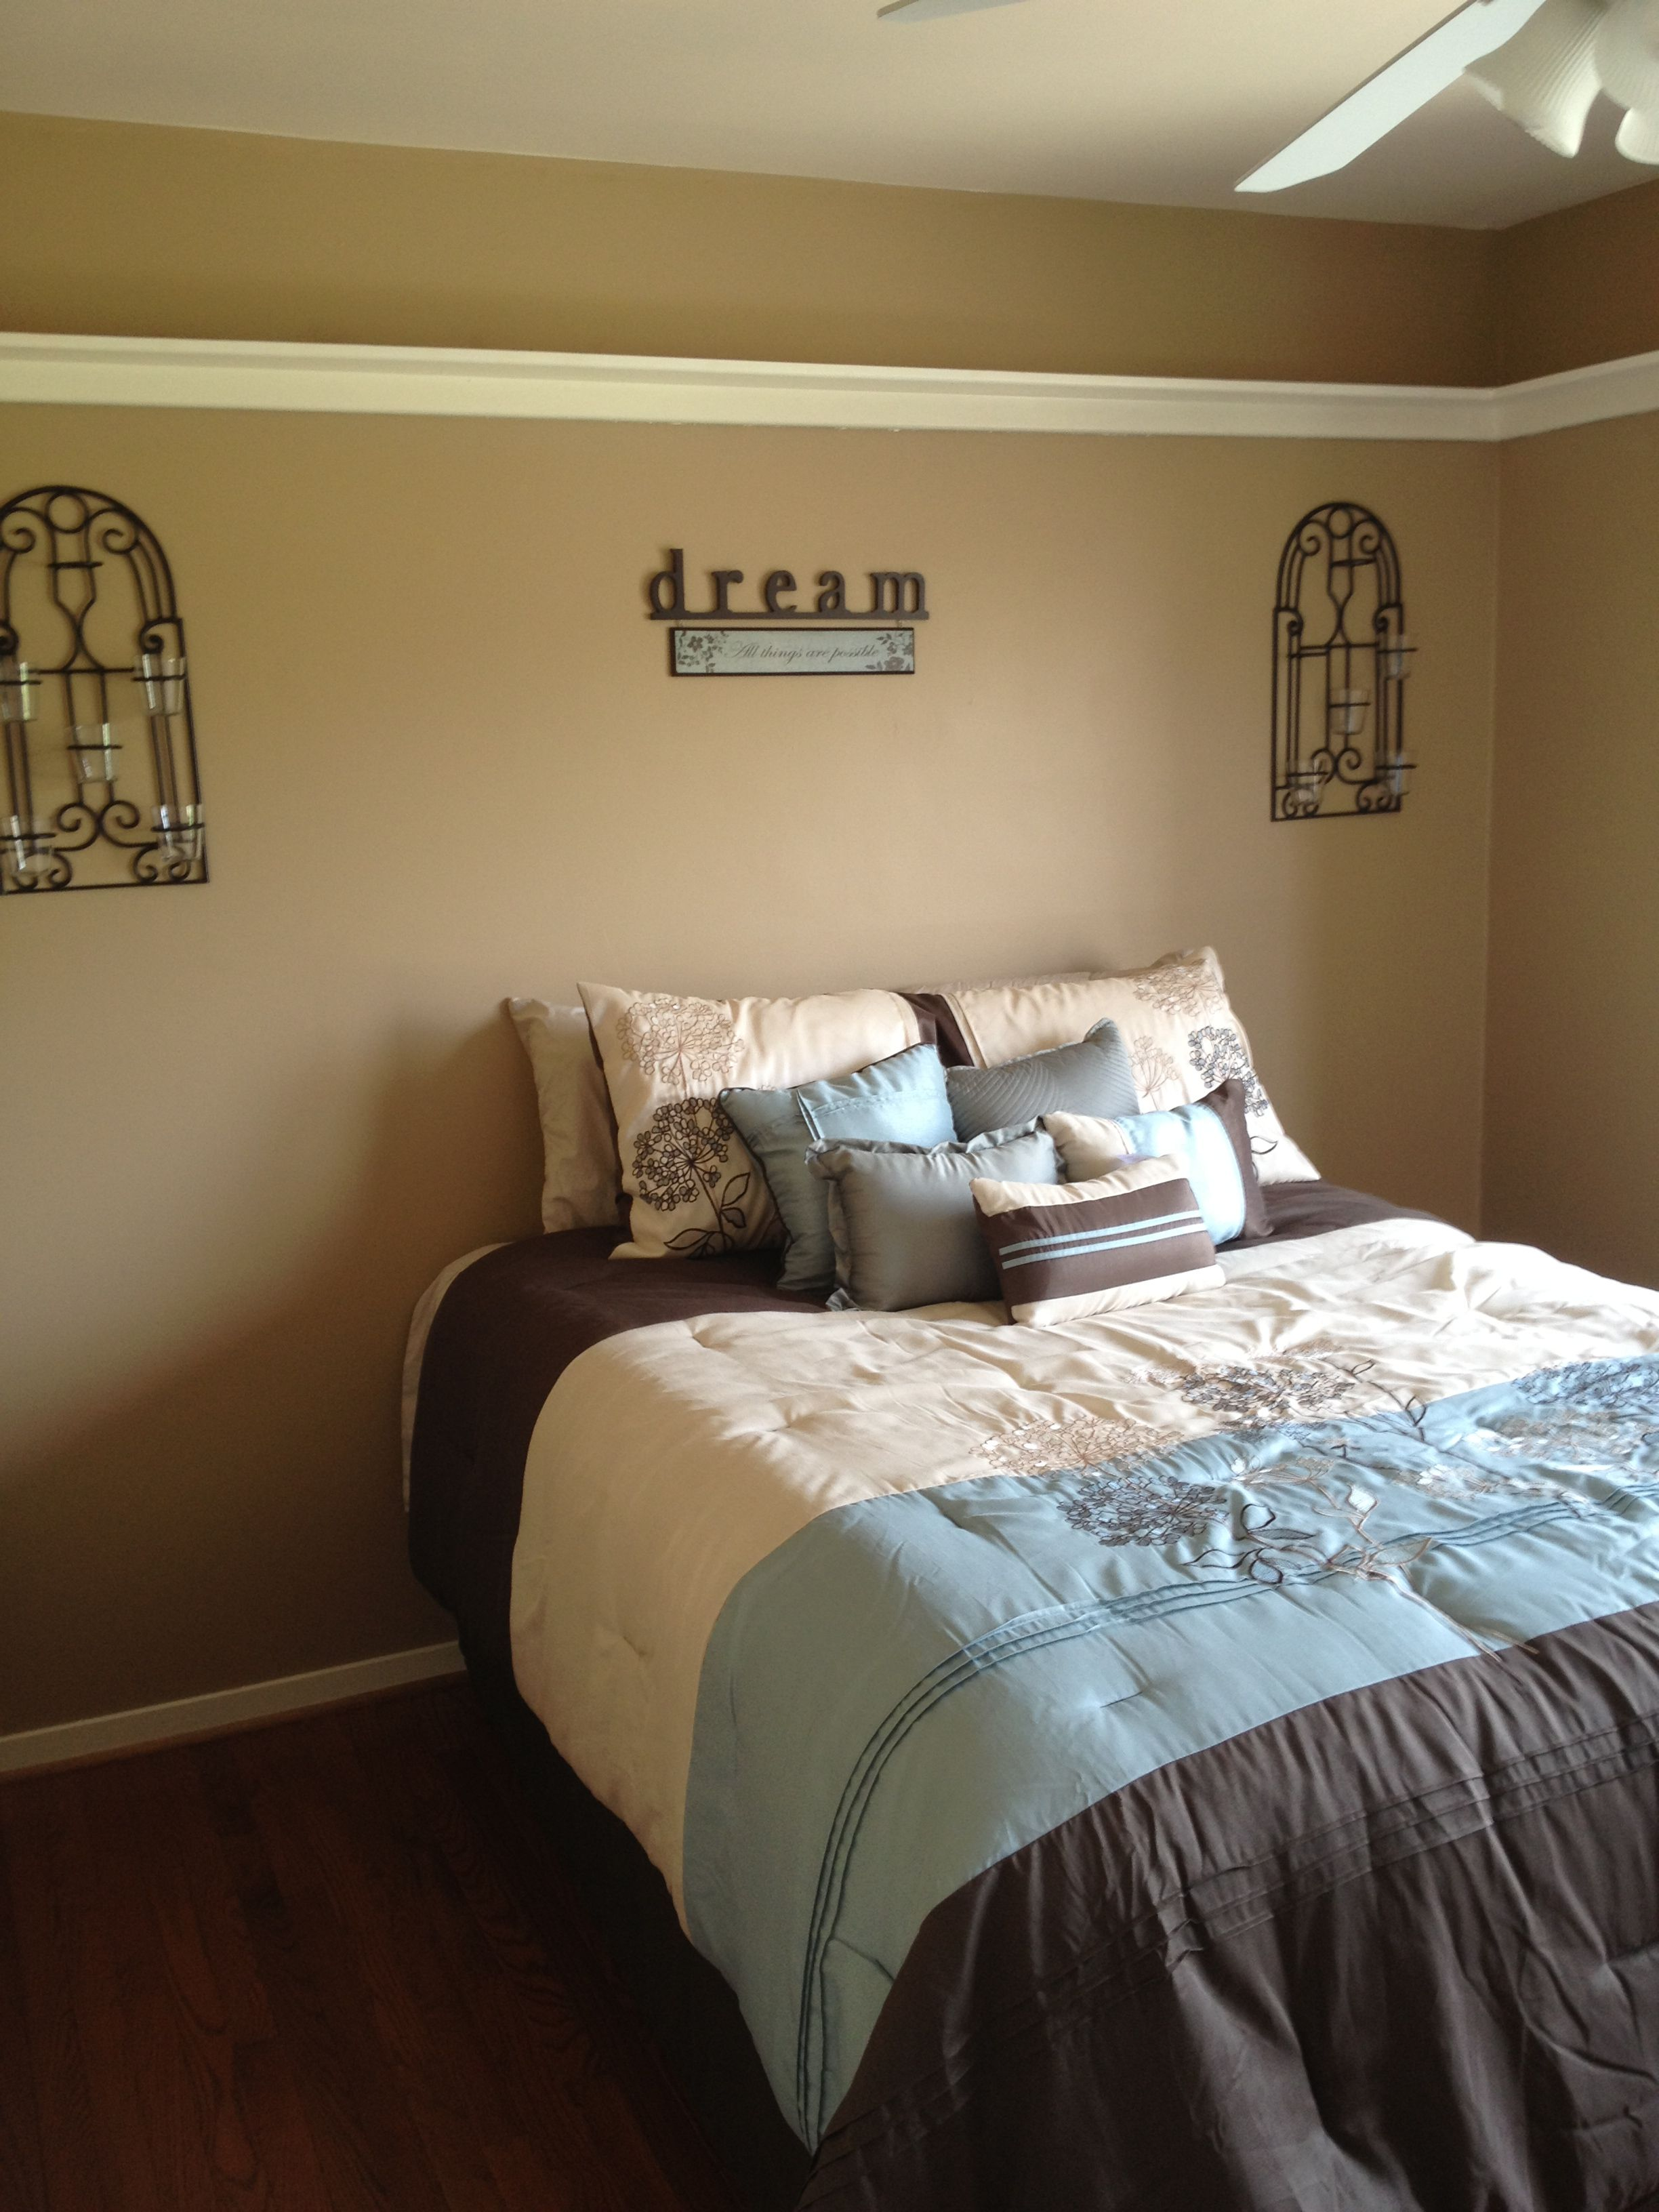 Blue Brown Tan Guest Bedroom Dream Guest Bedroom Dream Bedroom Master Bedroom Design